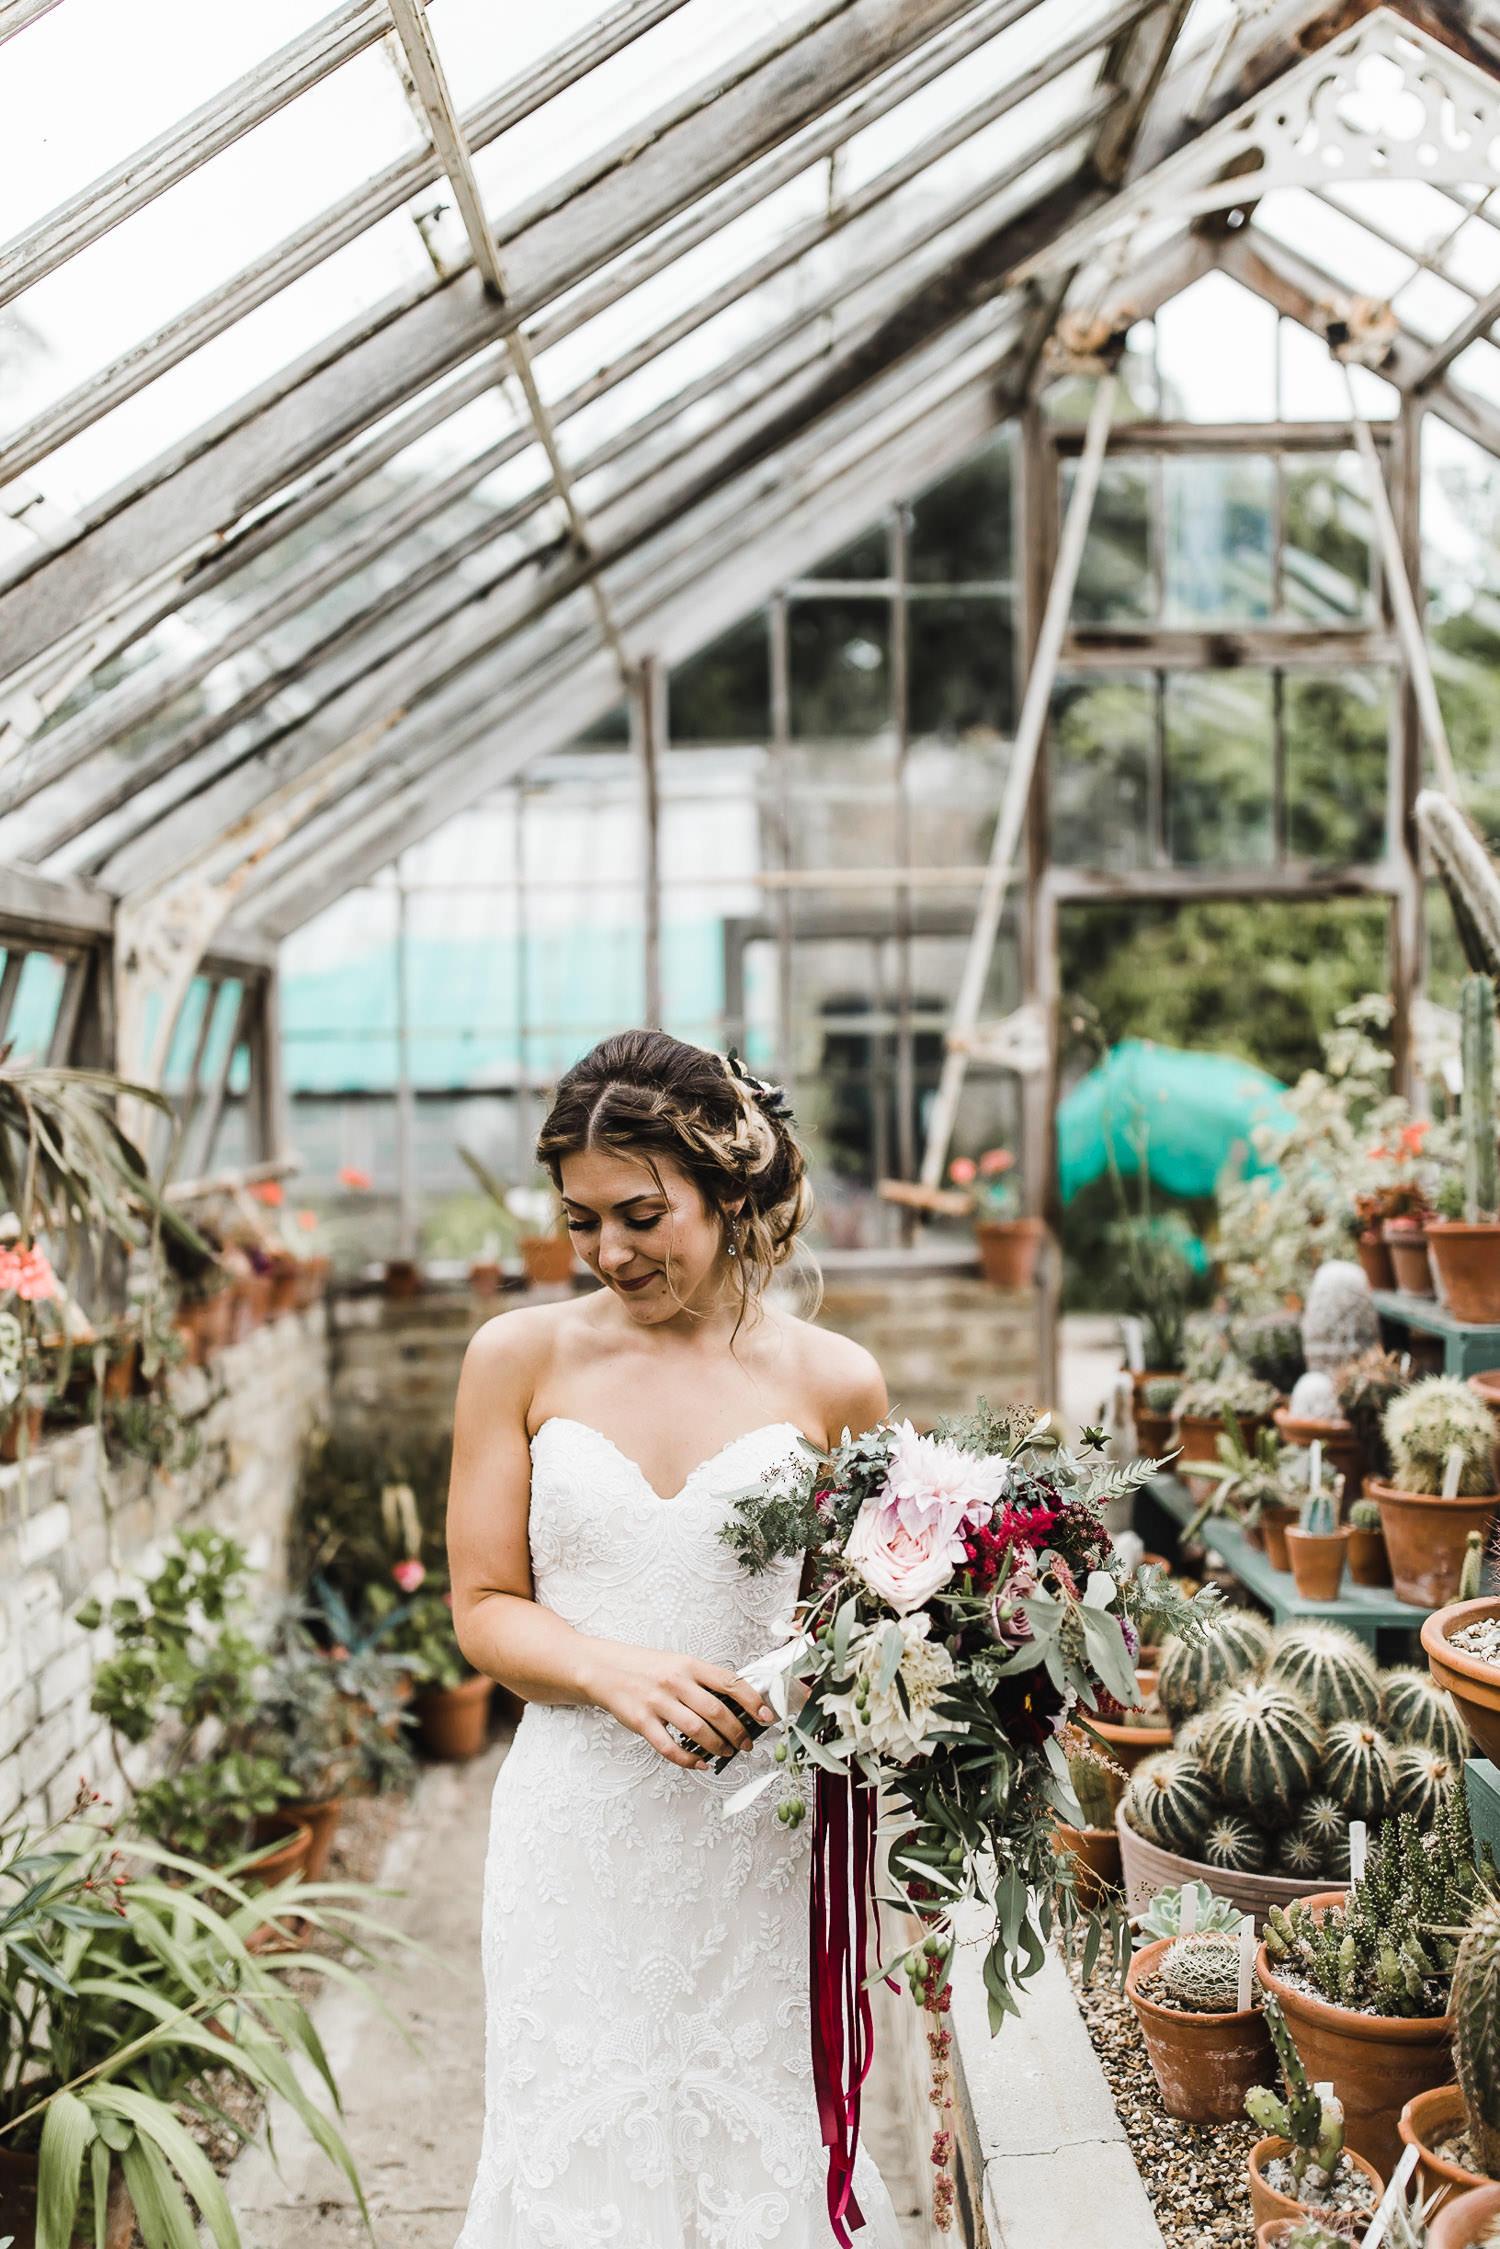 Margate_kent_seaside_fernery_greenhouse_wedding_0063.jpg